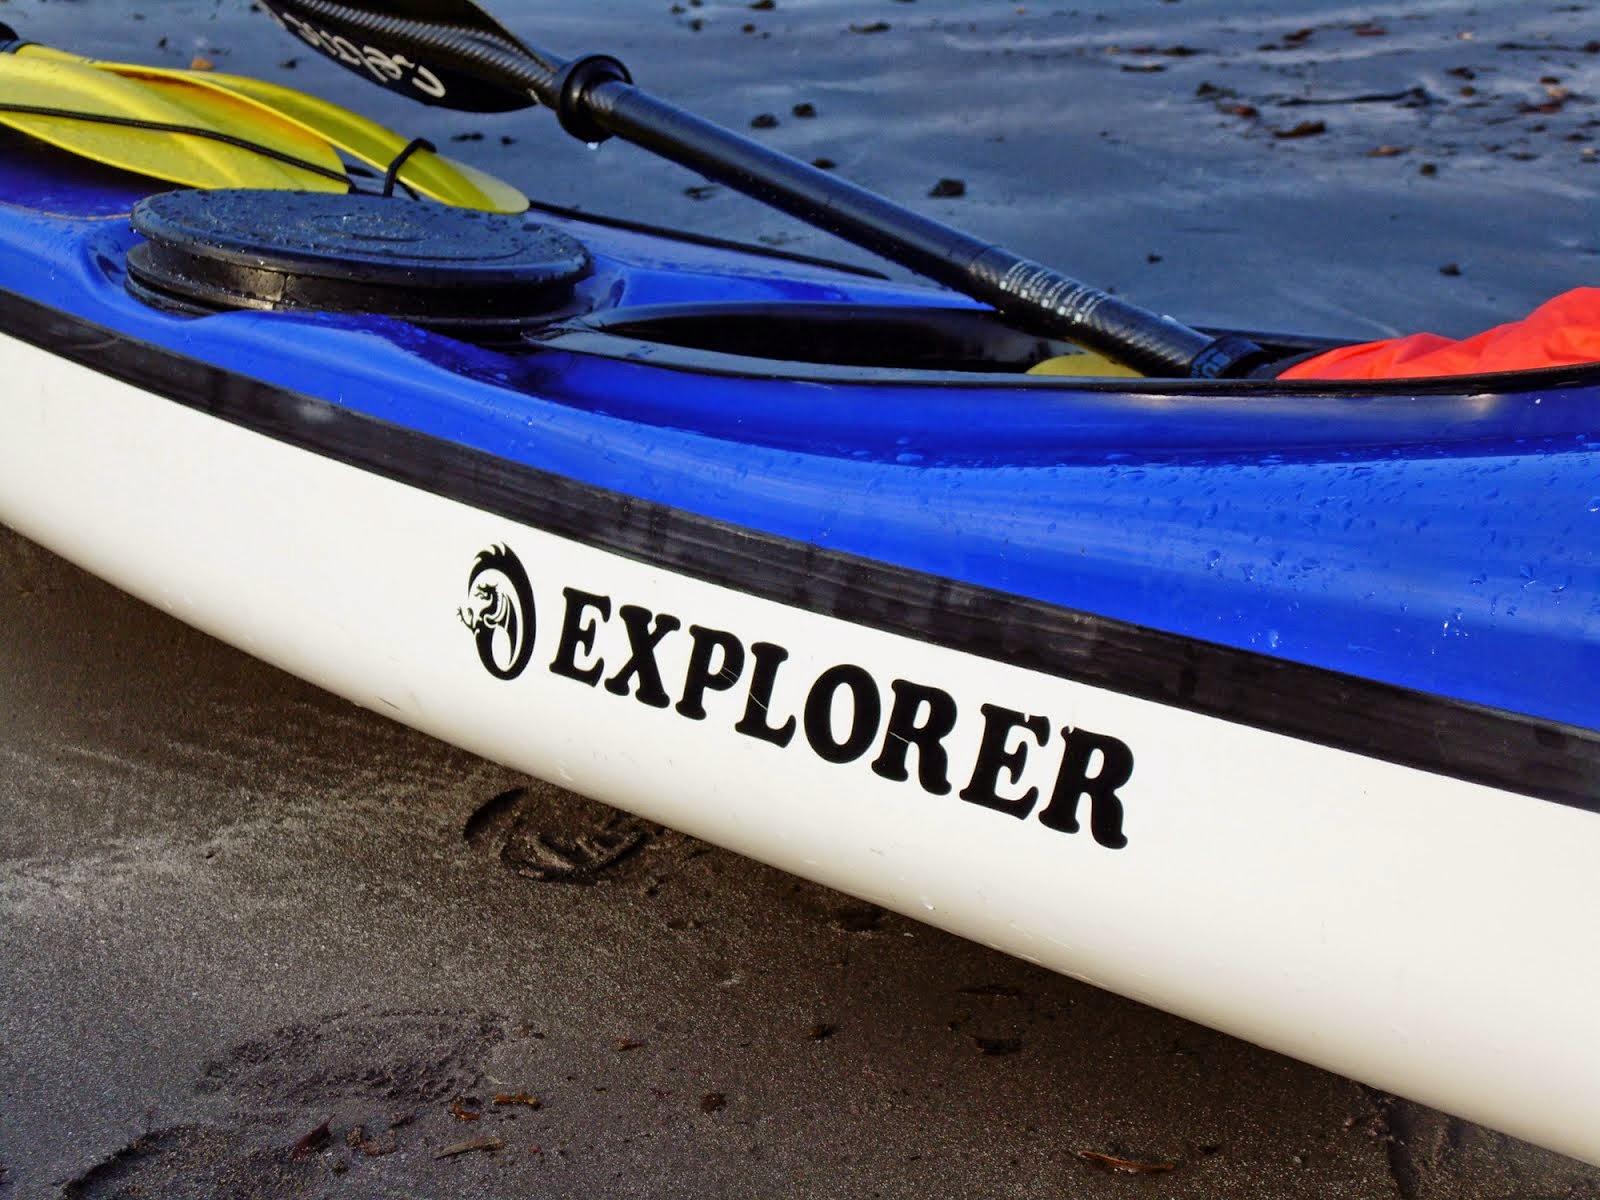 NDK Explorer